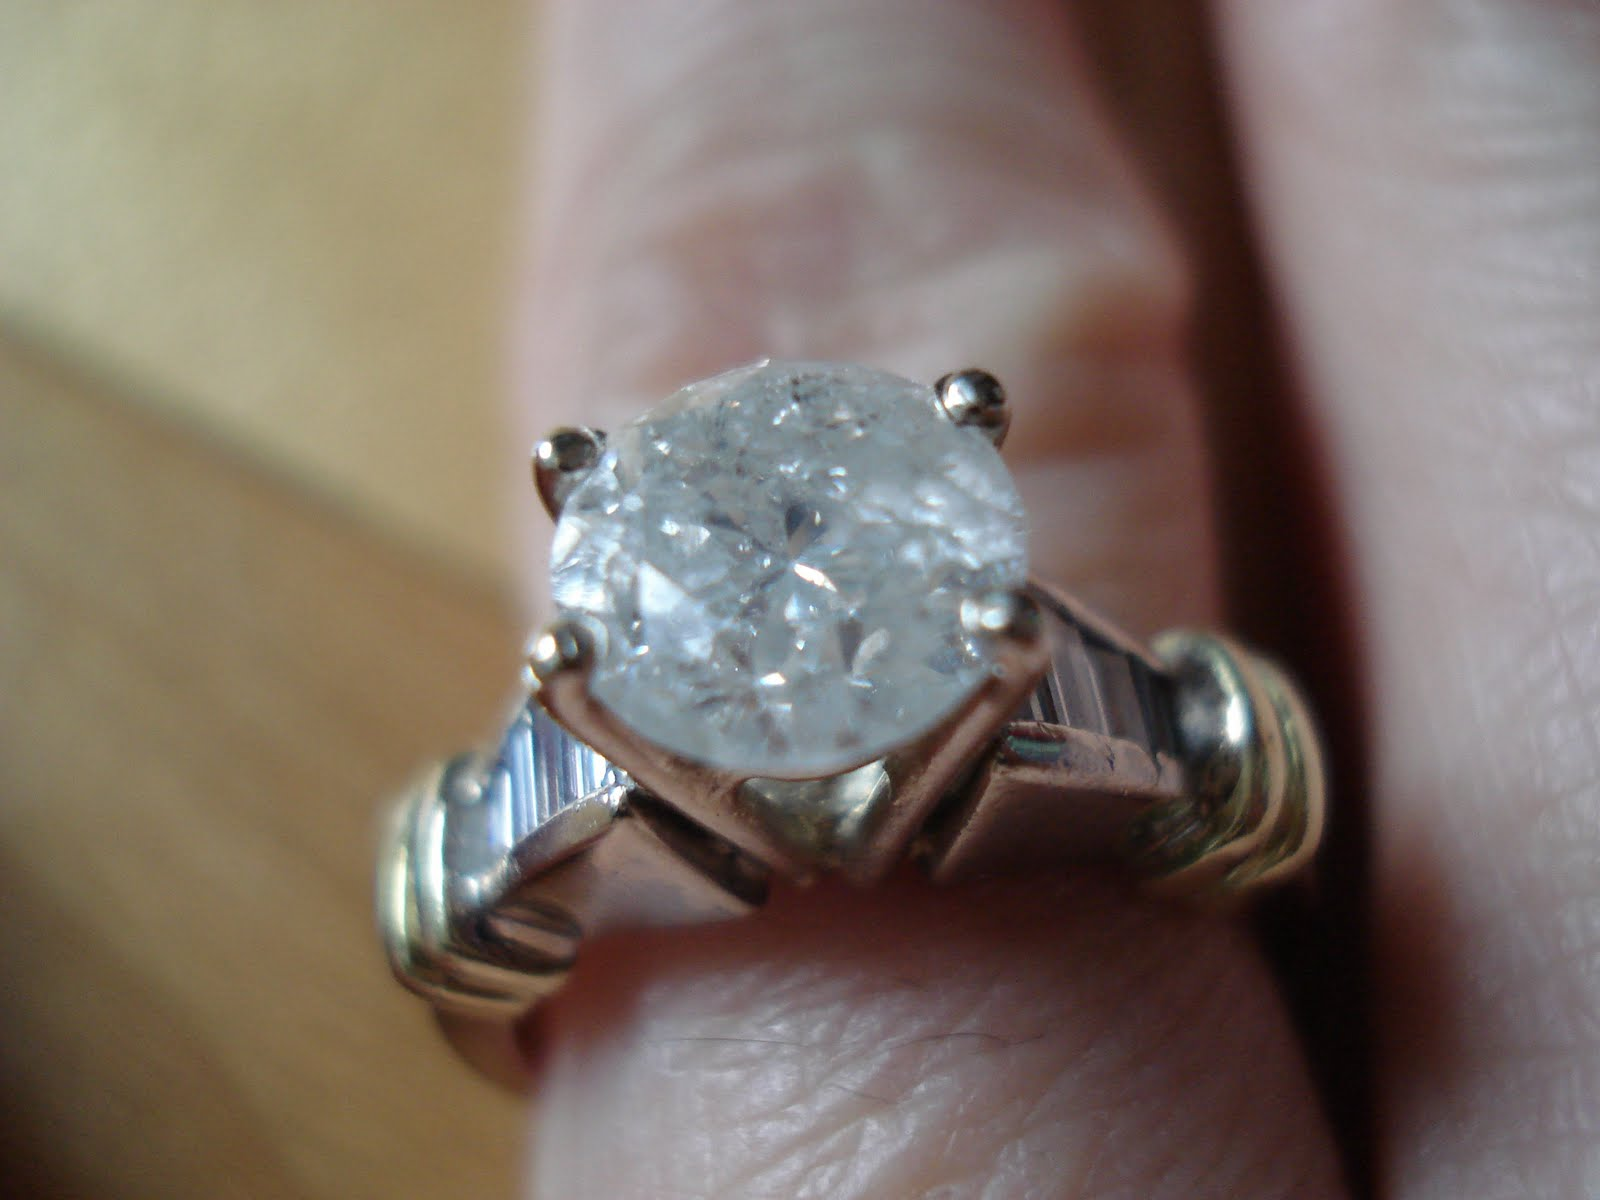 unlimiteditemsinc 18K 750 SOLITARY ACCENT APROX 2 CARAT DIAMOND RING PRICE